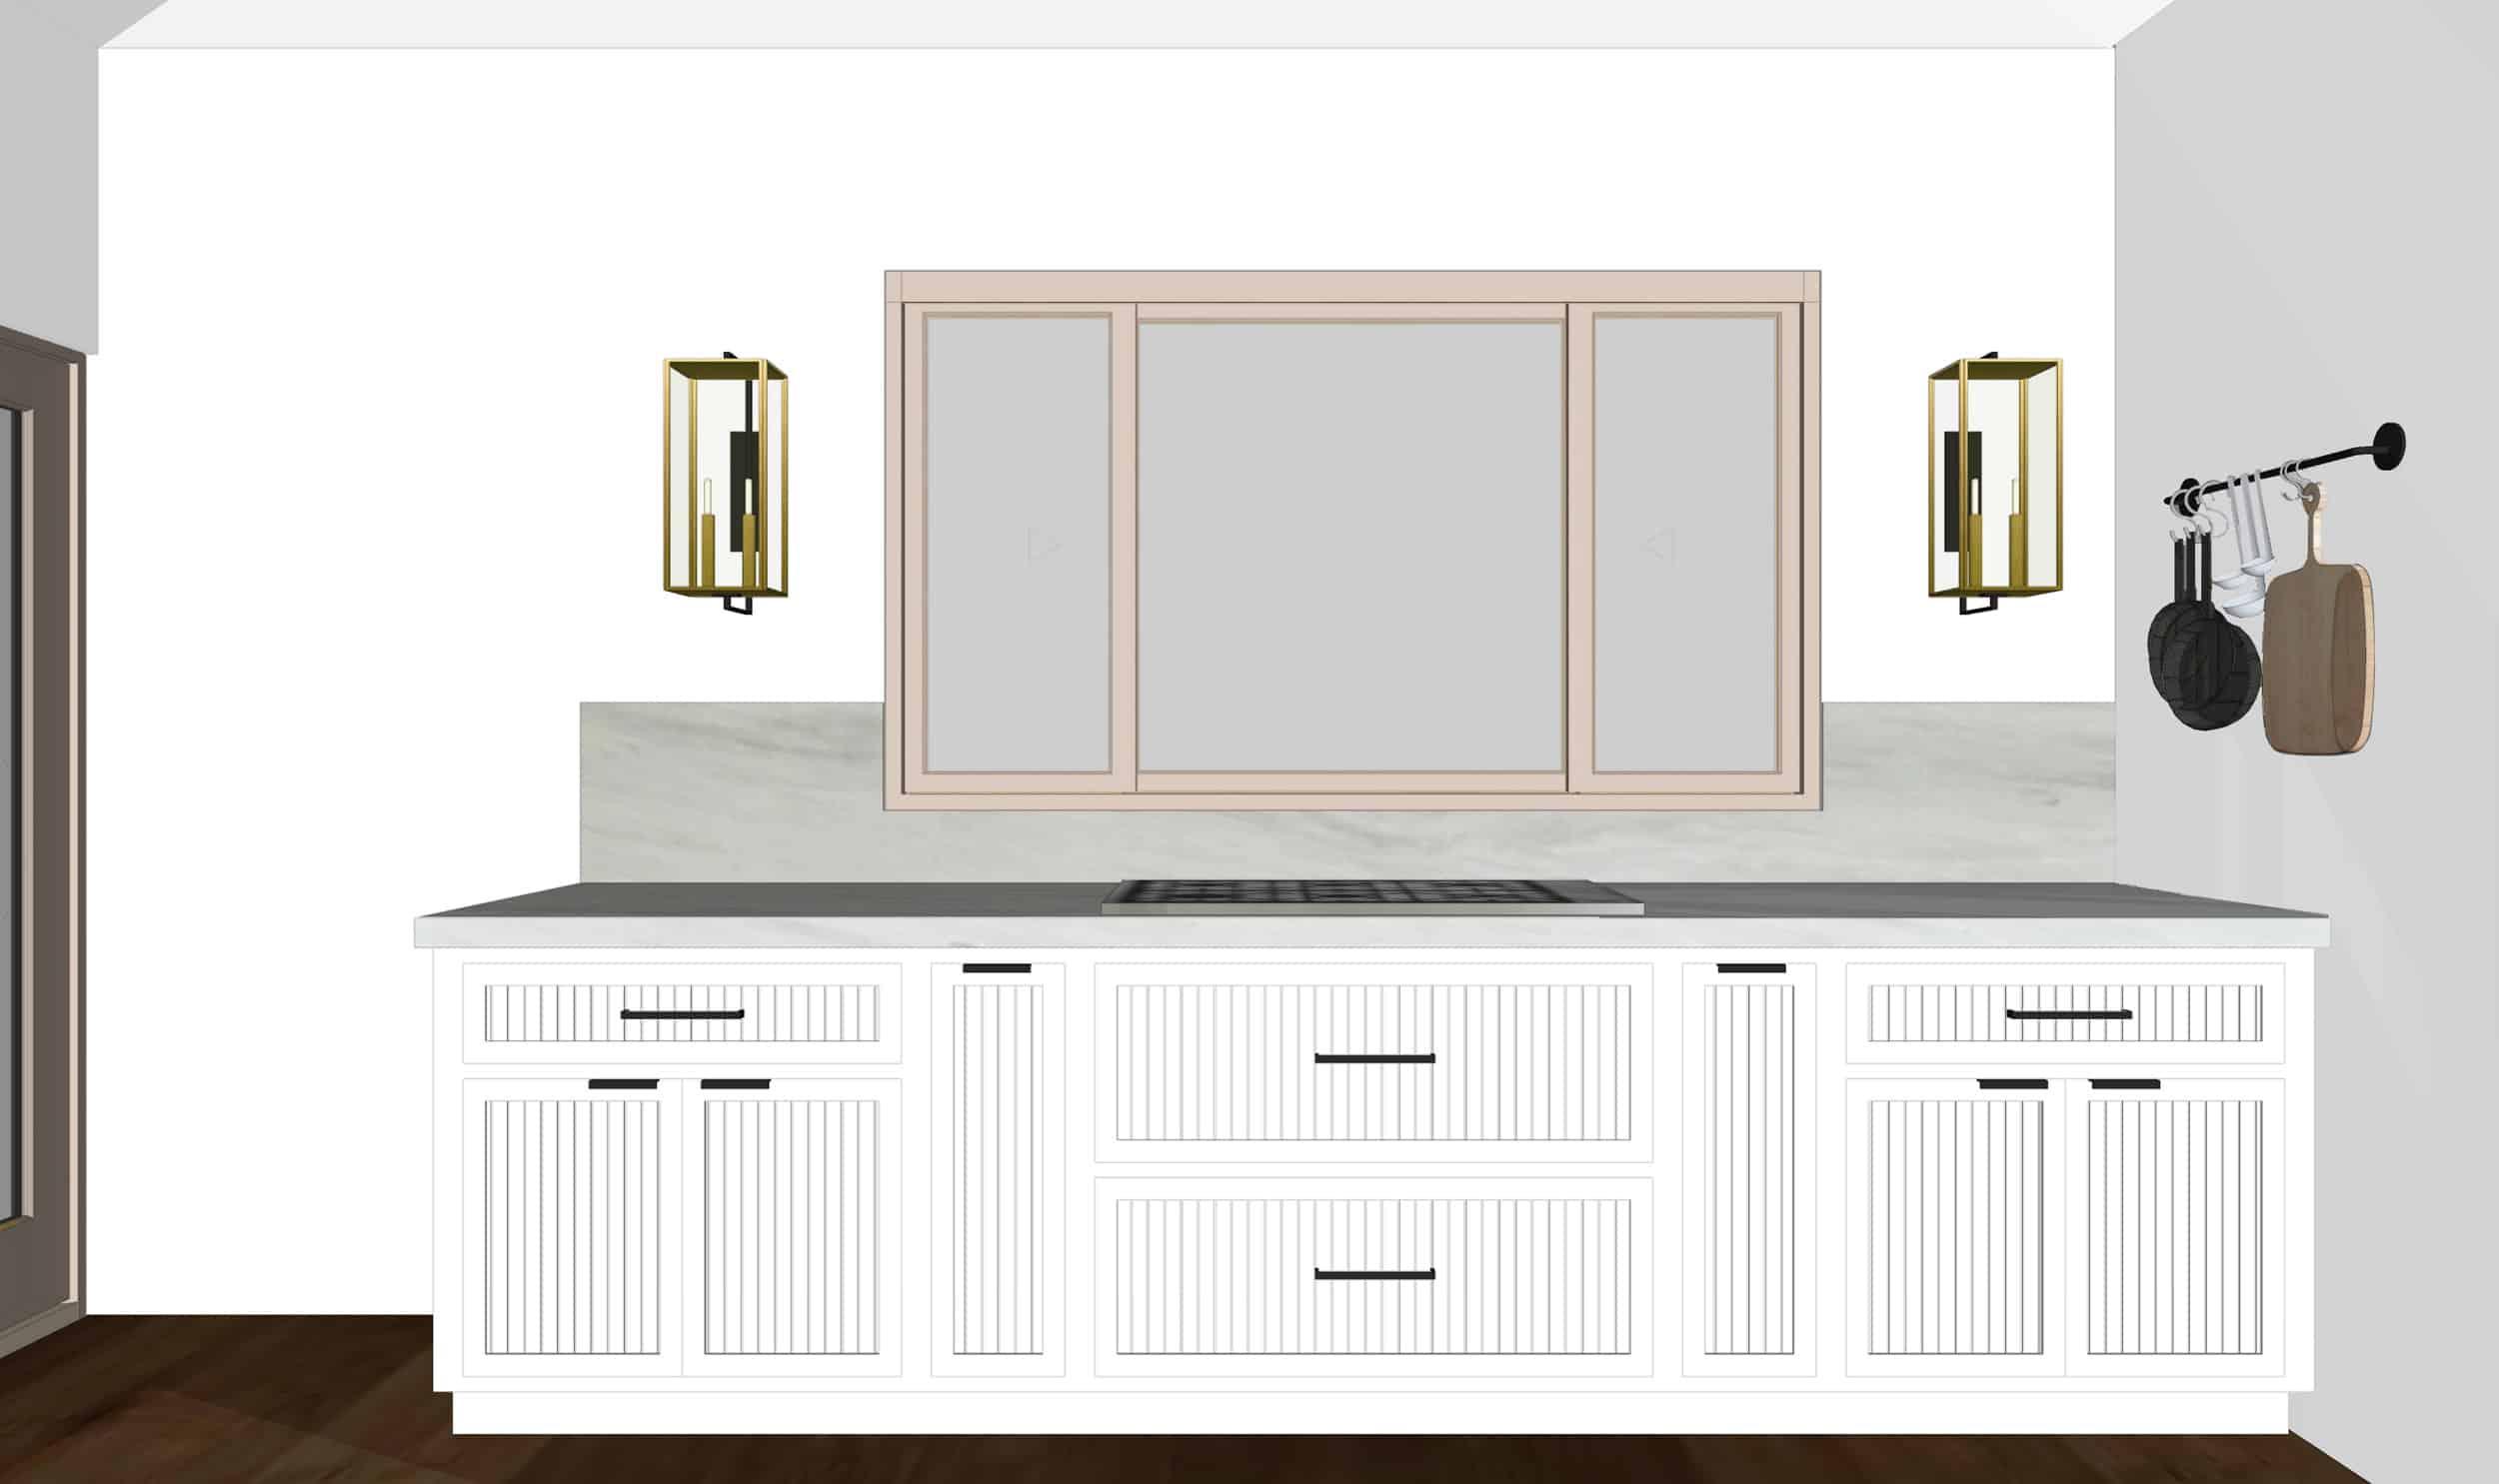 Emily Henderson Mountain Fixer Upper I Design You Decide Kitchen Render 09 Fnl